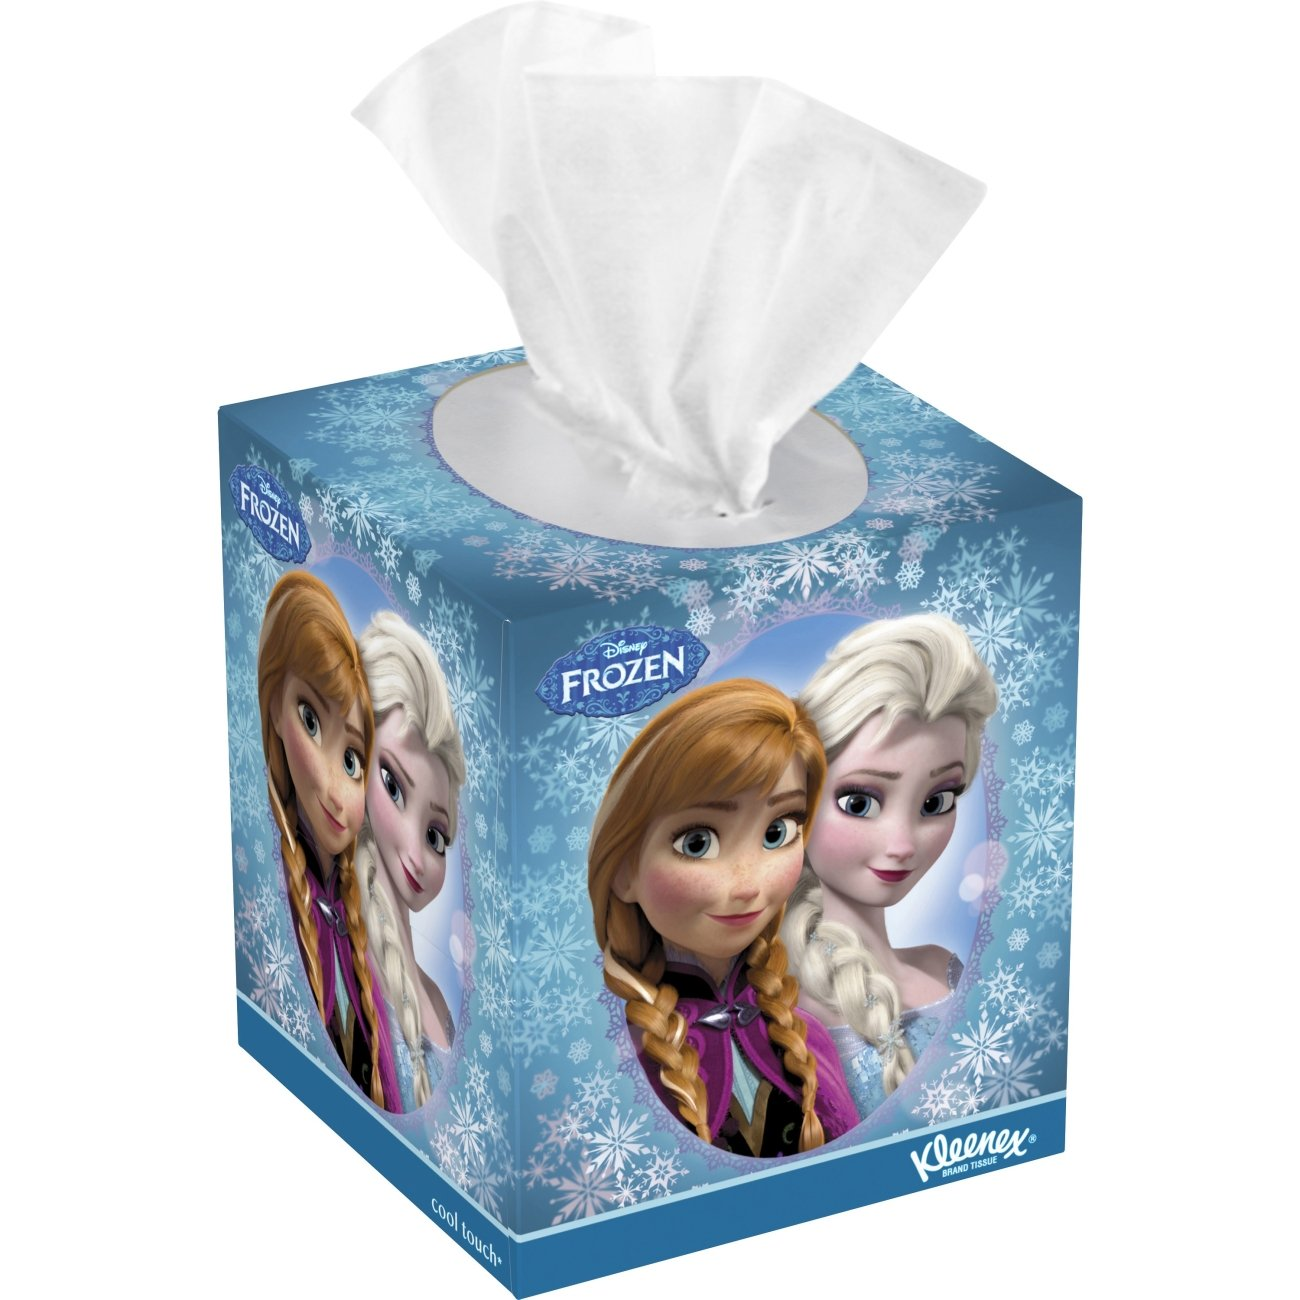 Cool Touch Facial Tissue, 3 Ply, 50 Sheets per Box, 1 per Box (並行輸入品) B006U1JW7K